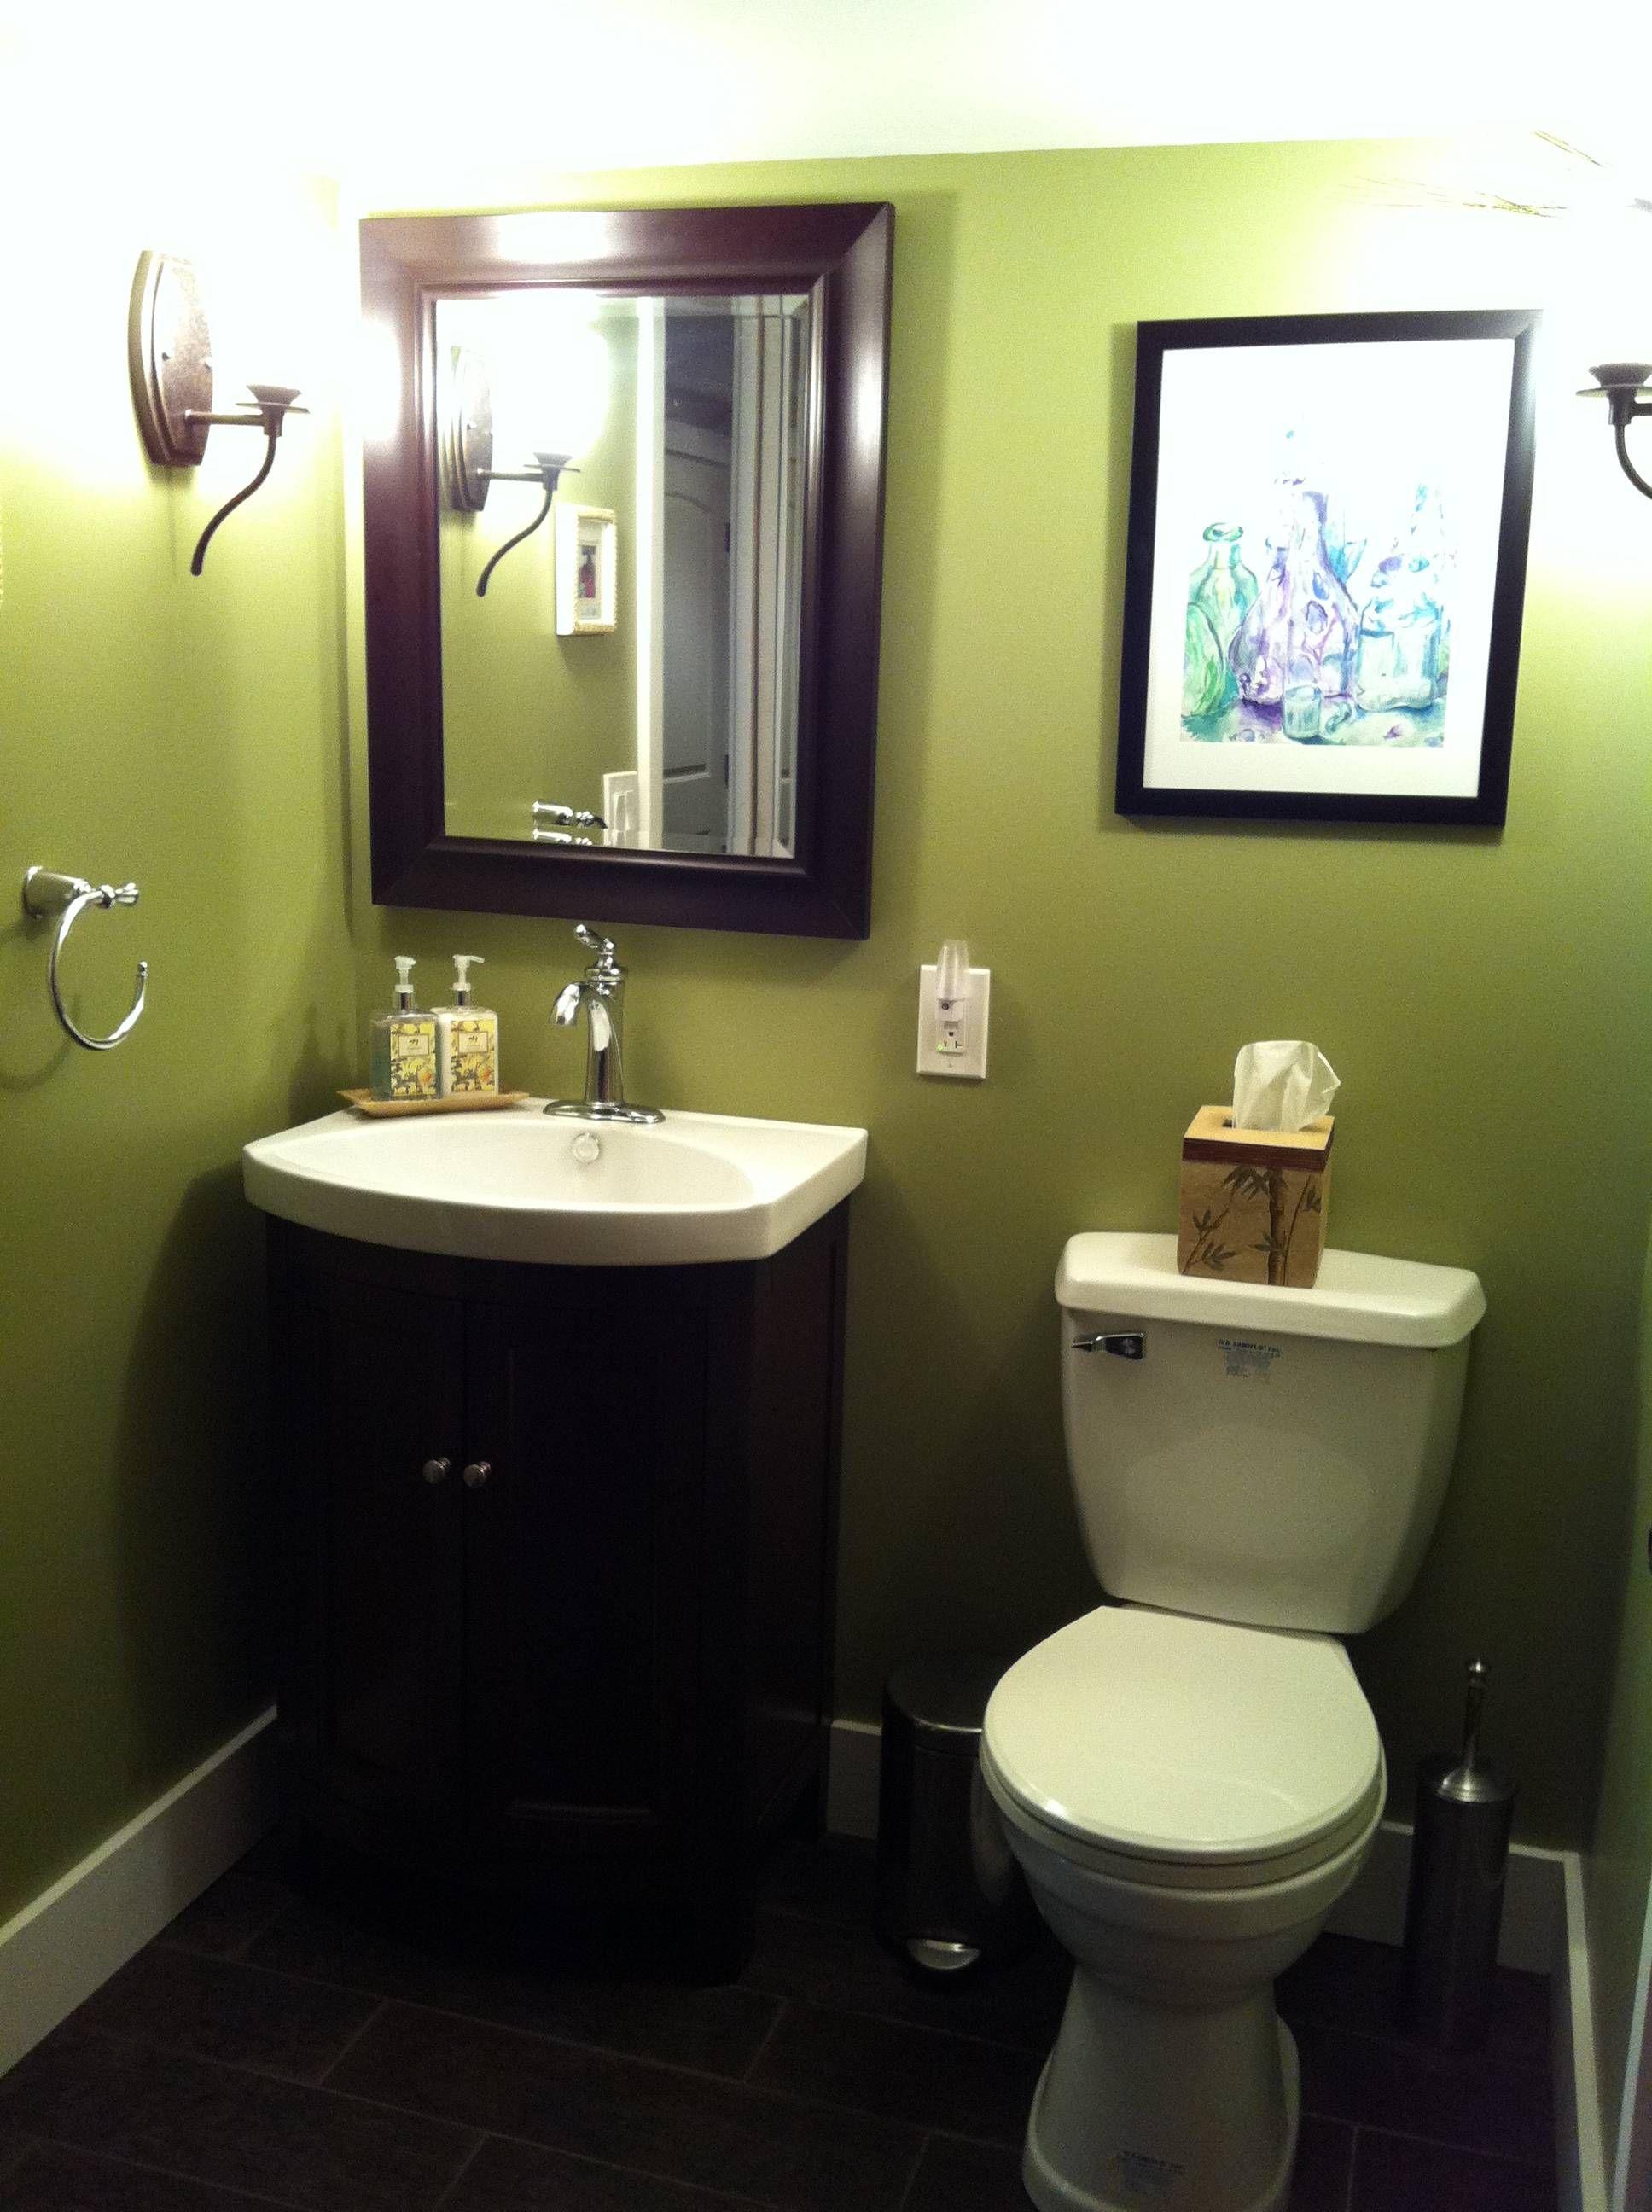 Powder Room Powder Room Decor Bathroom Design Small Powder Room Design